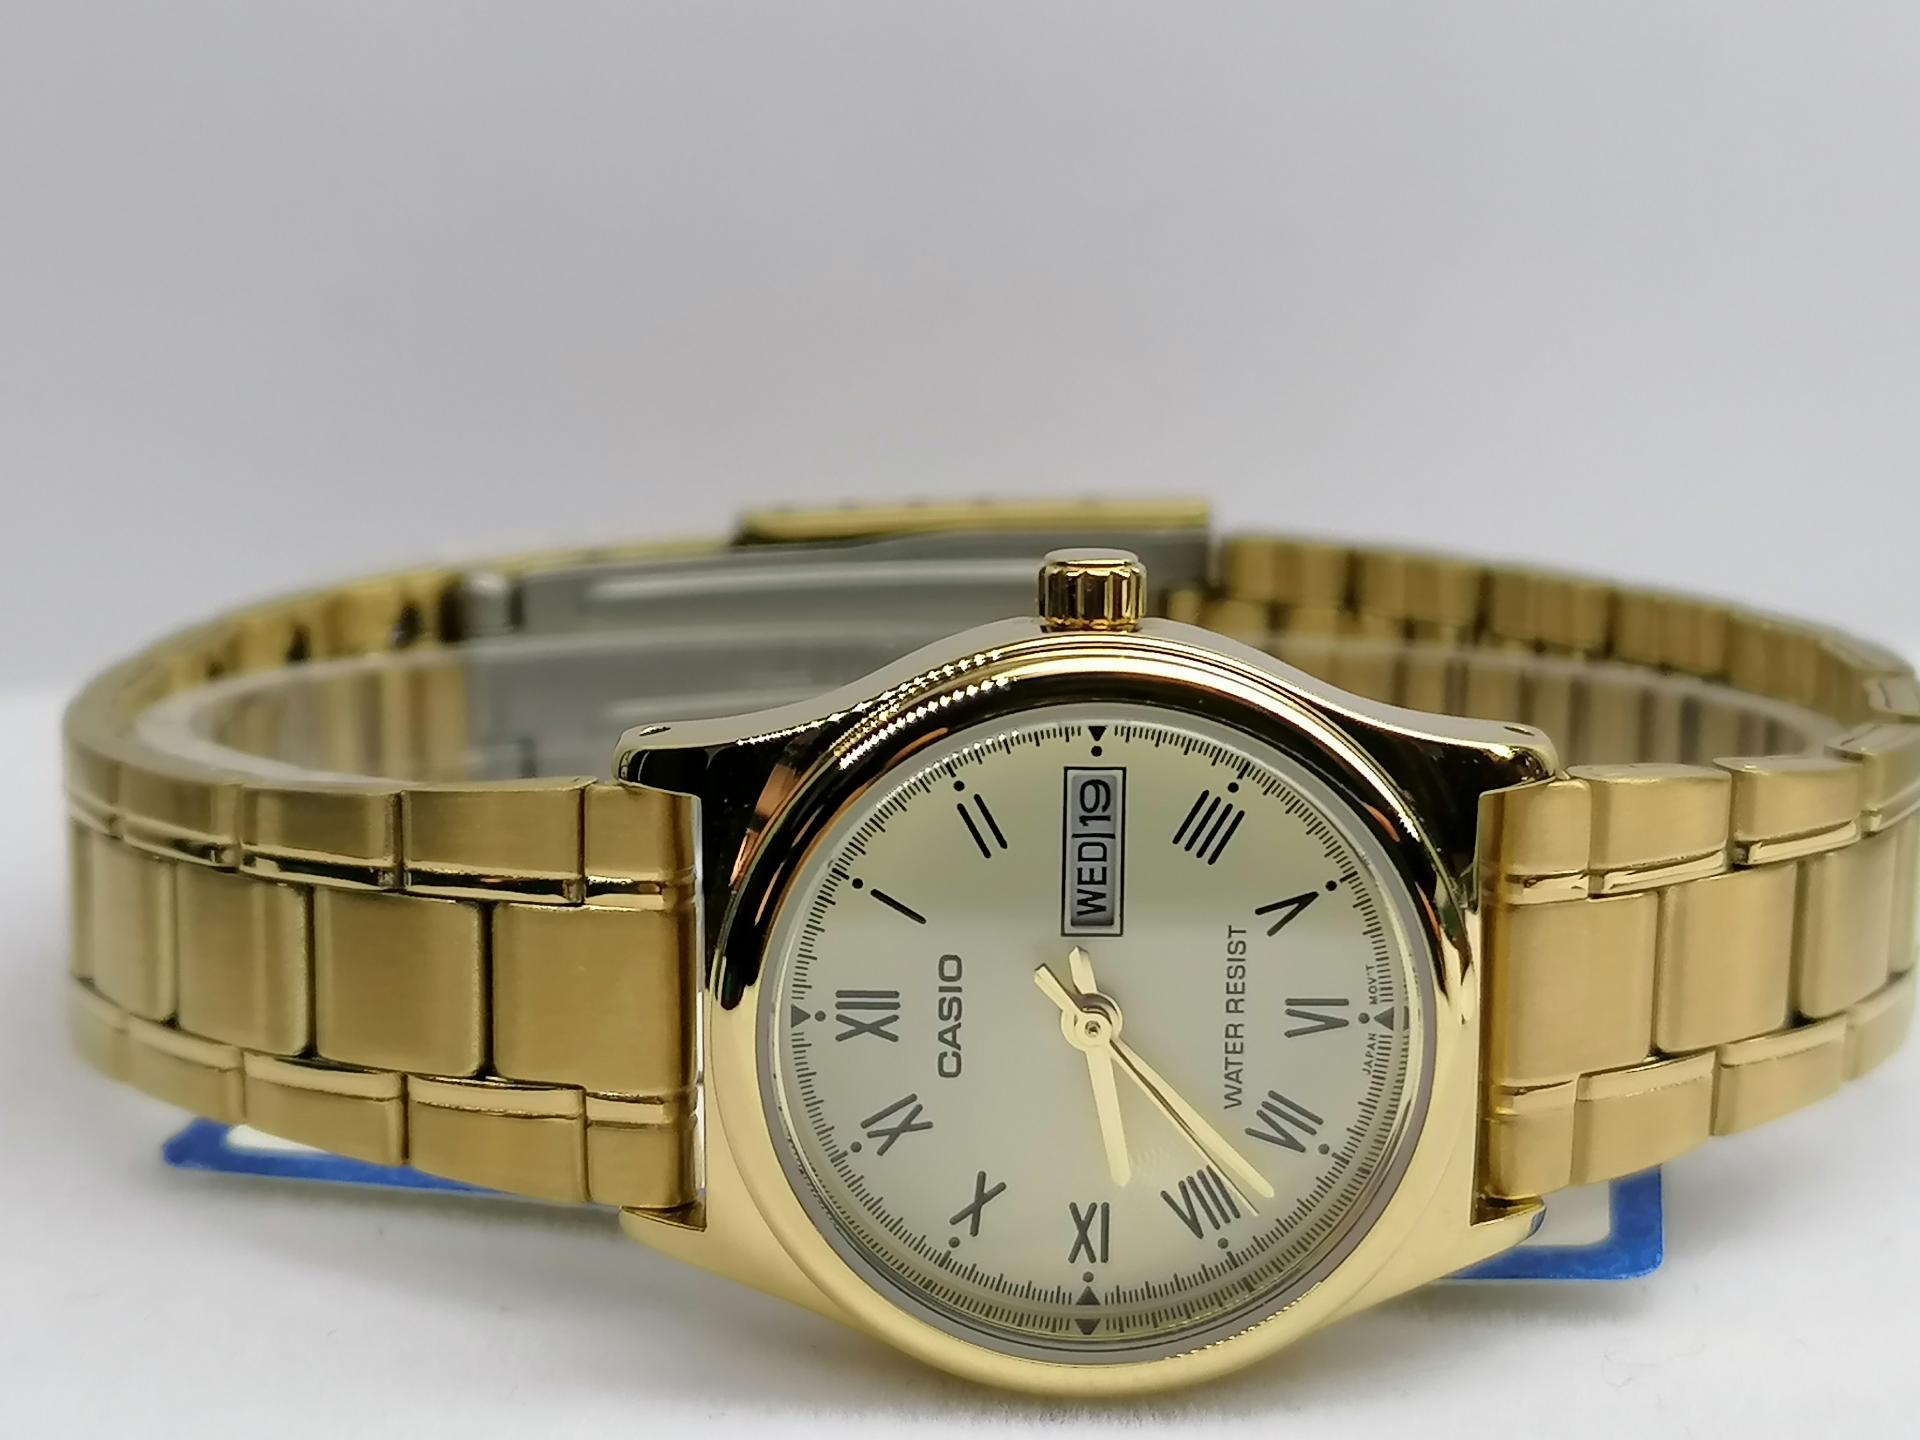 Reloj Casio Mujer Dorado Esfera Blanca LTP-V006G-9BUDF